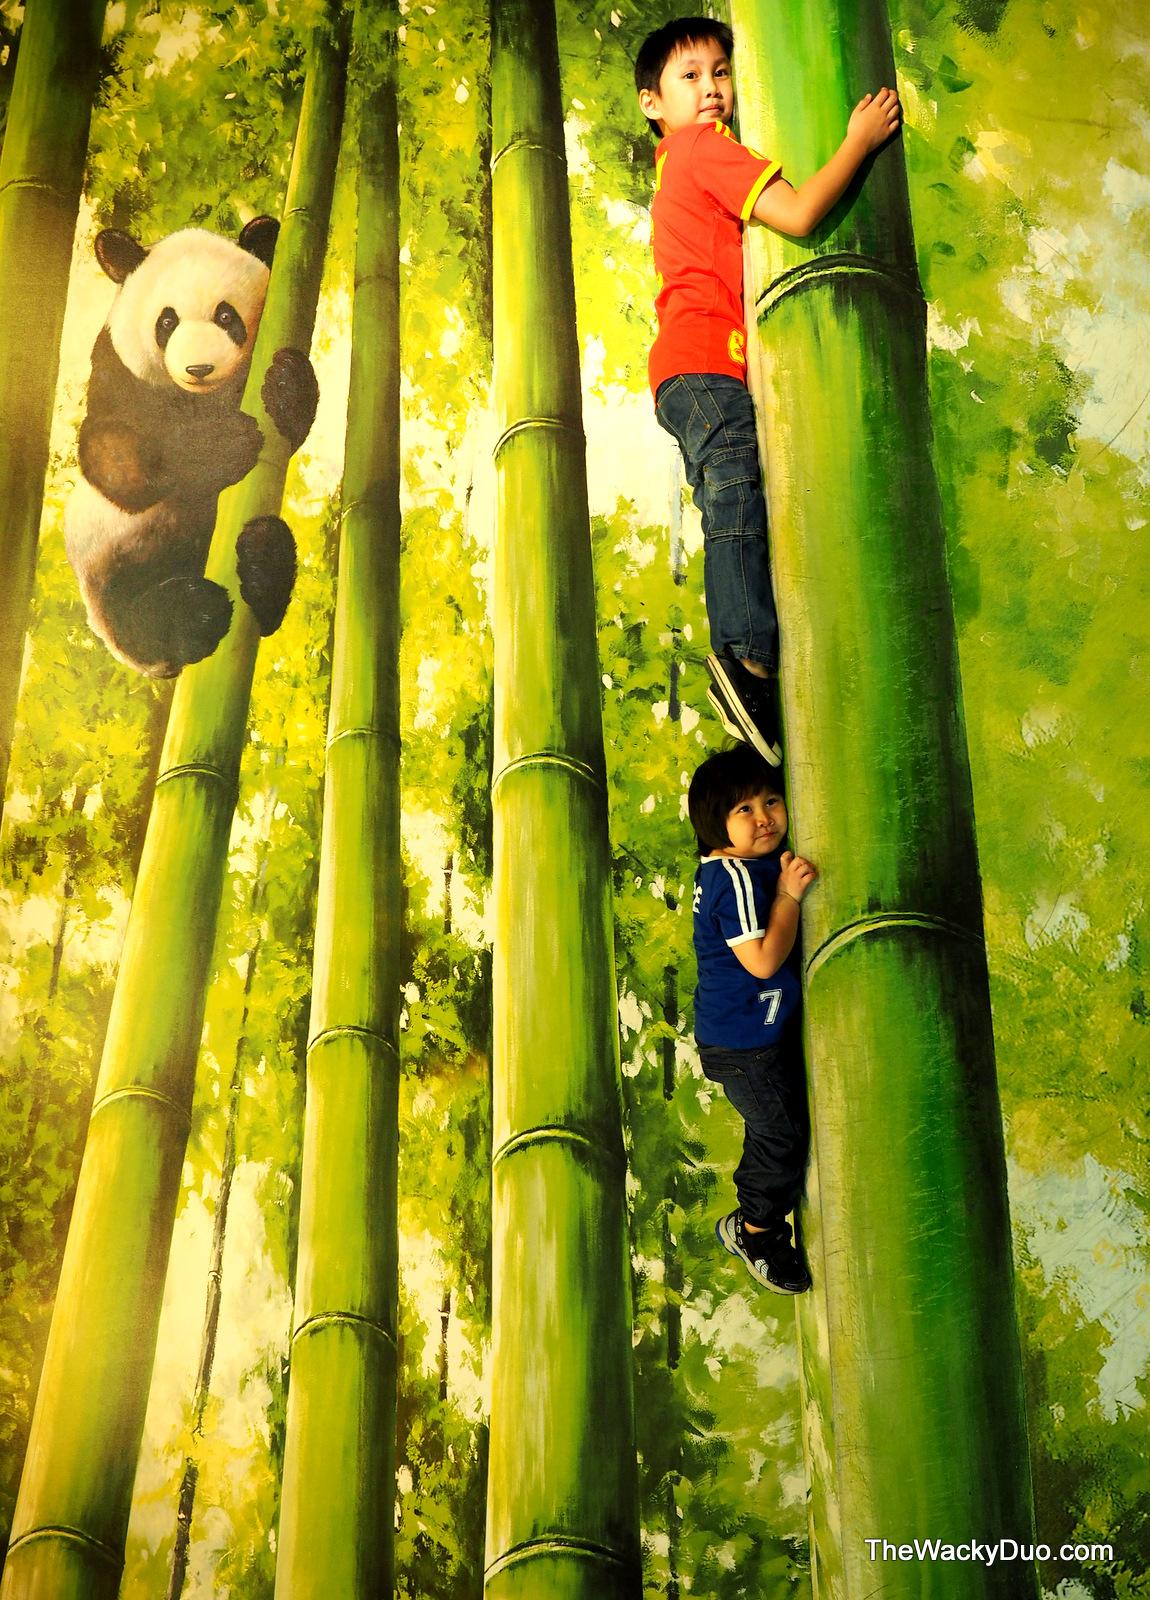 Trickeye Museum Rws Singapore Guide For Families The Wacky Duo Tiket Pandas